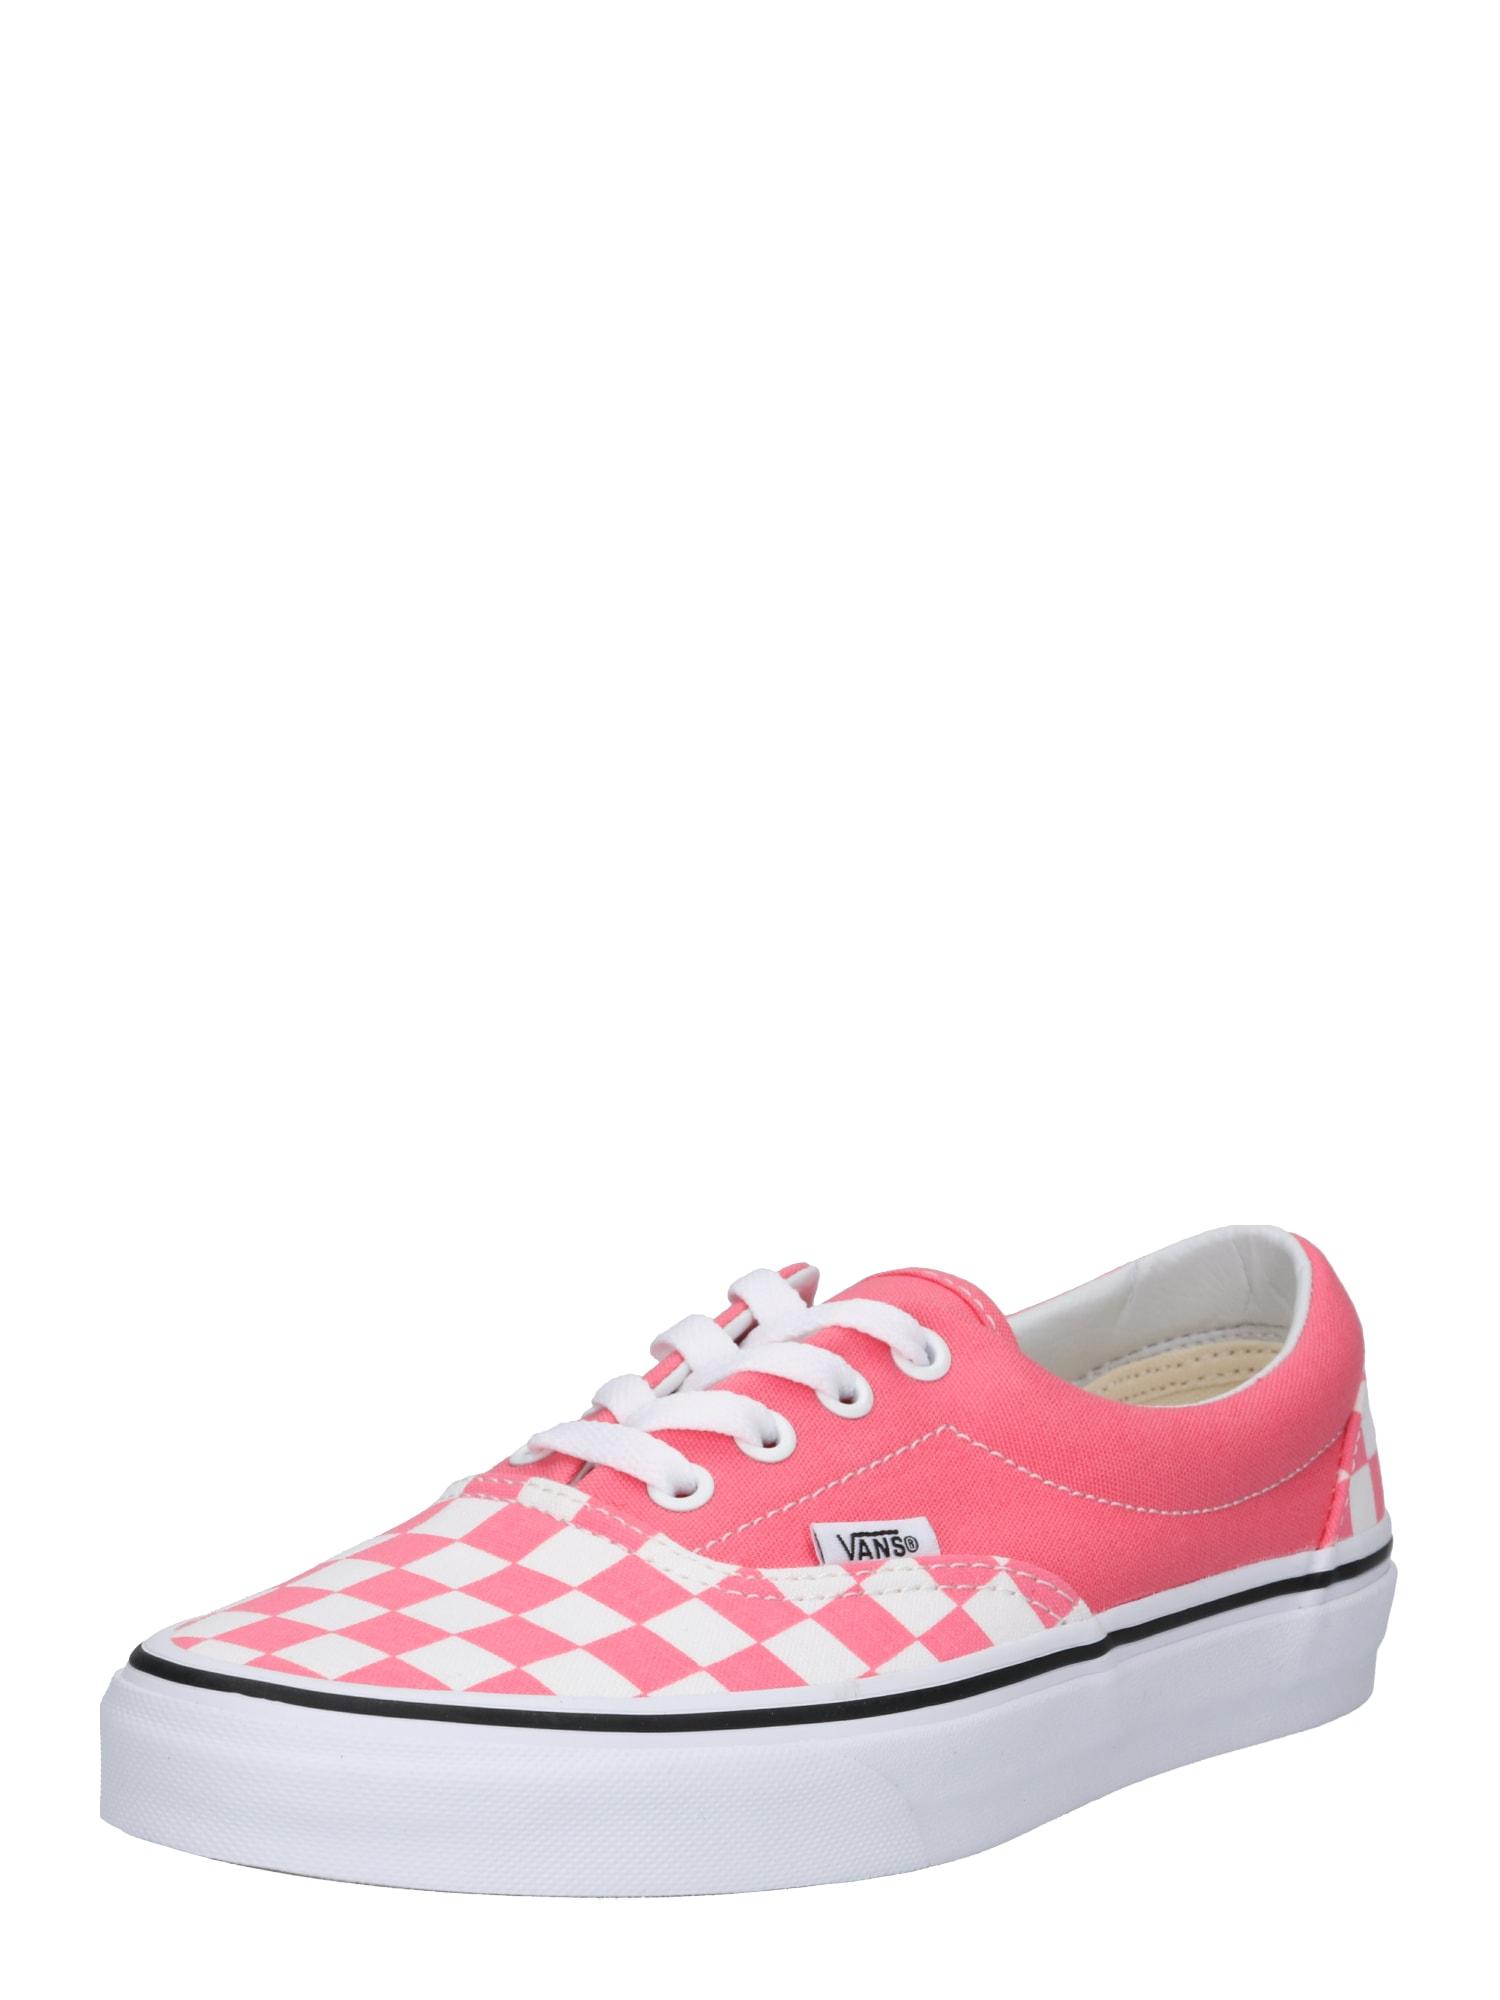 VANS, Dames Sneakers laag 'UA Era', pitaja roze / wit